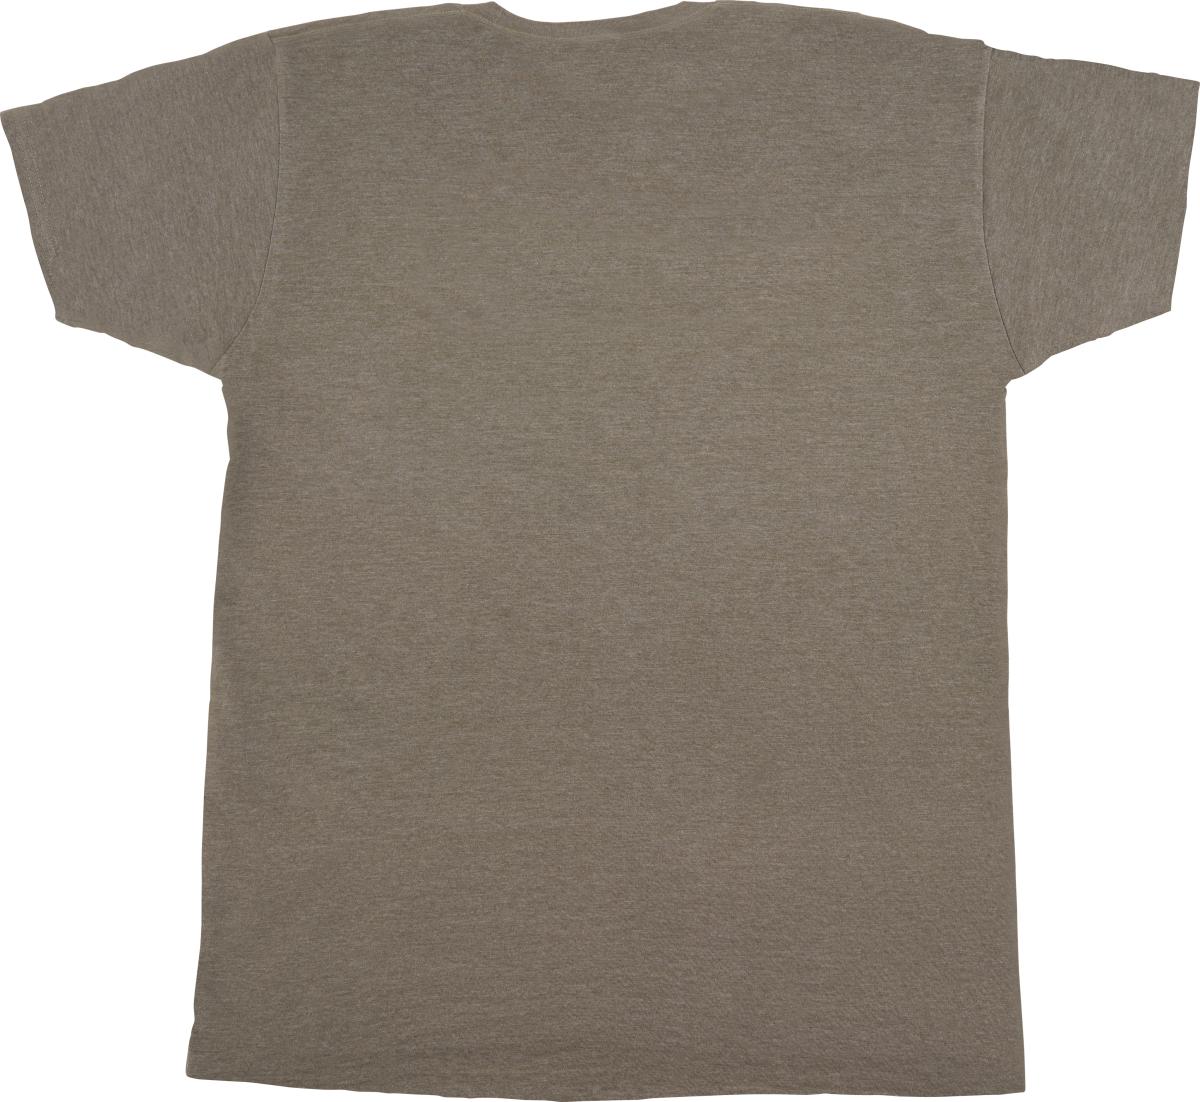 Charvel Charvel® Guitar Logo T-Shirt, Heather Green, XXL